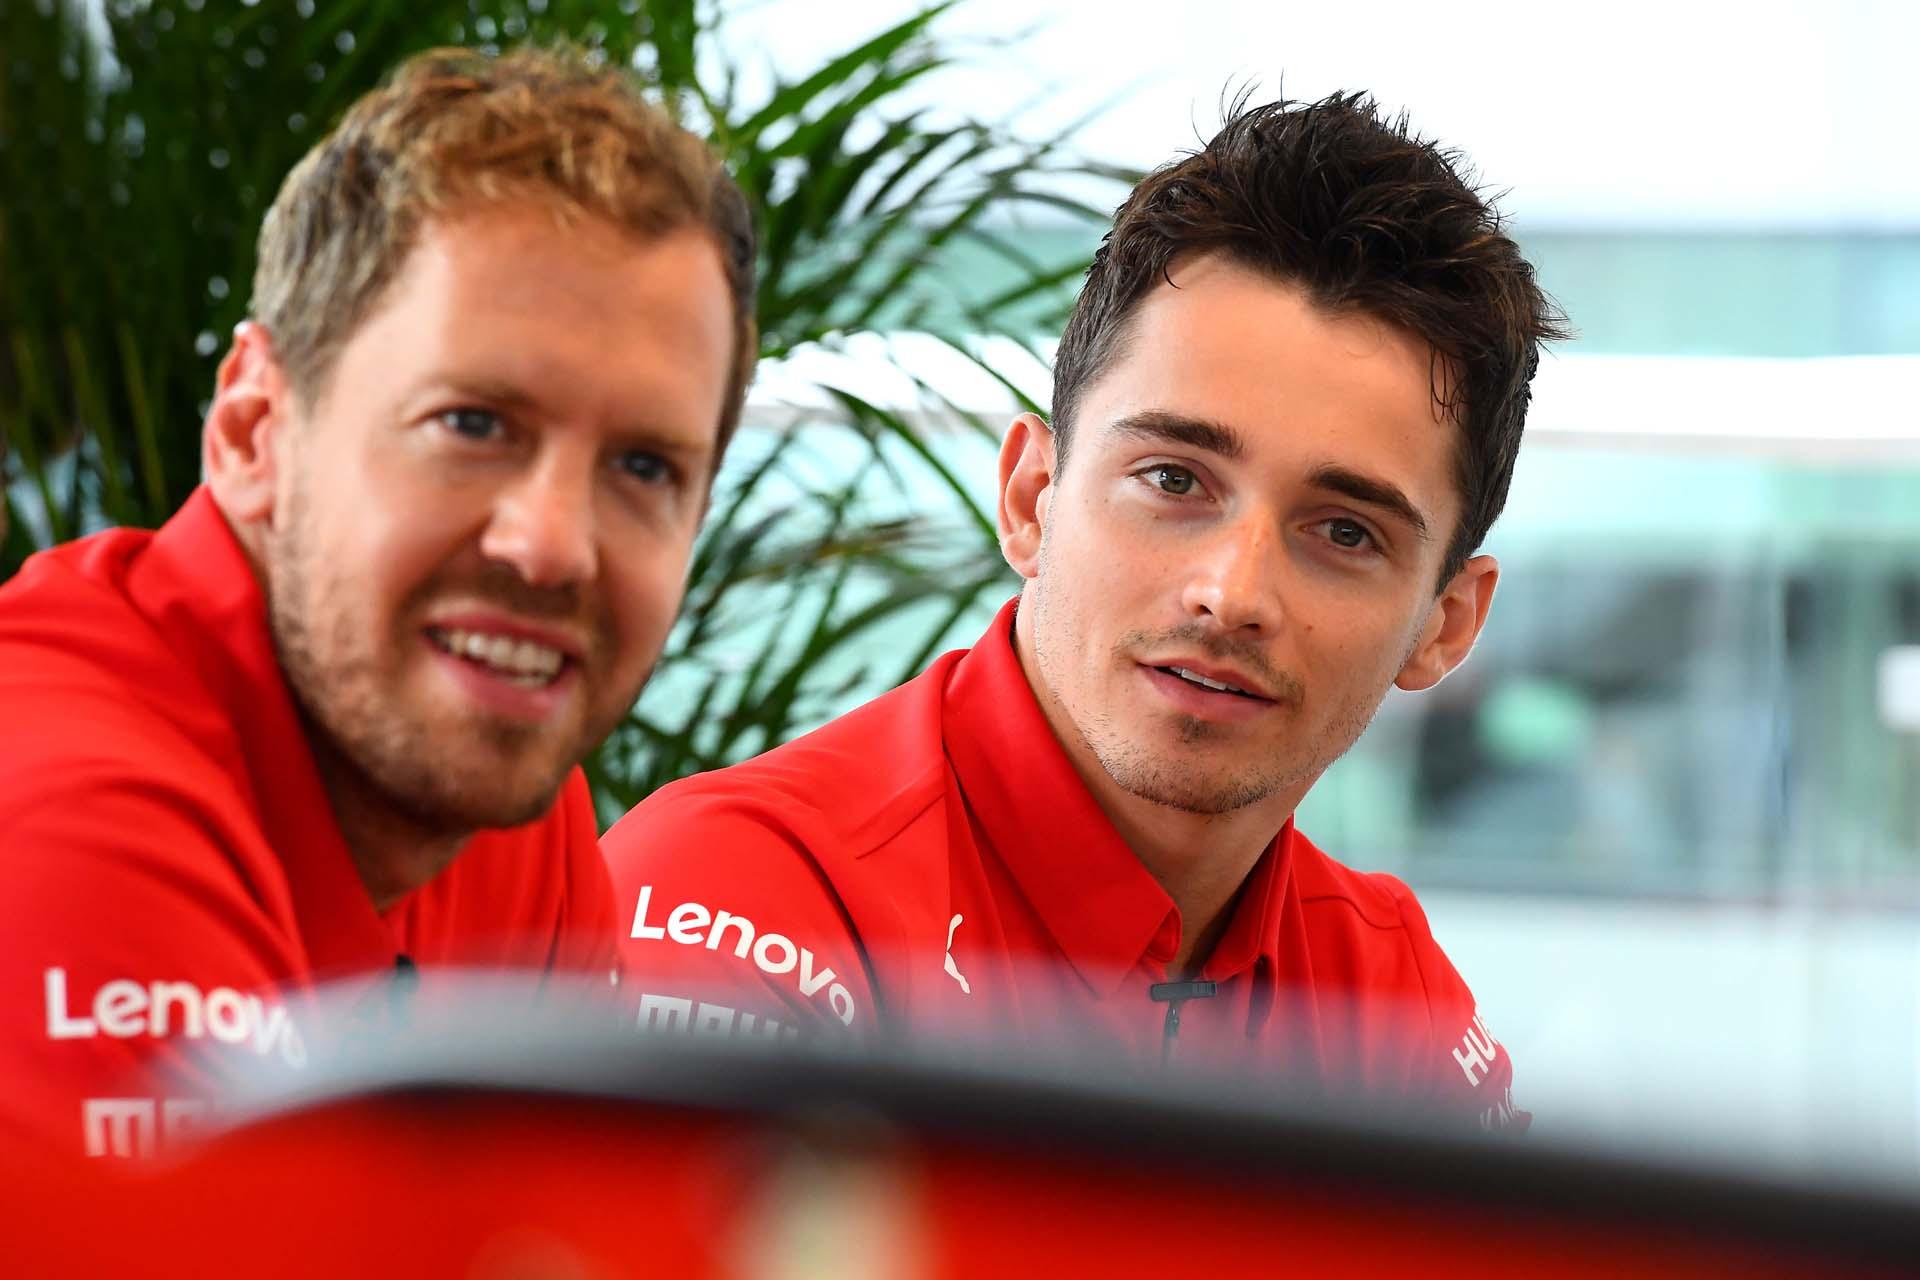 GP GRAN BRETAGNA F1/2019 - GIOVEDÌ 11/07/2019 credit: @Scuderia Ferrari Press Office Sebastian Vettel Charles Leclerc